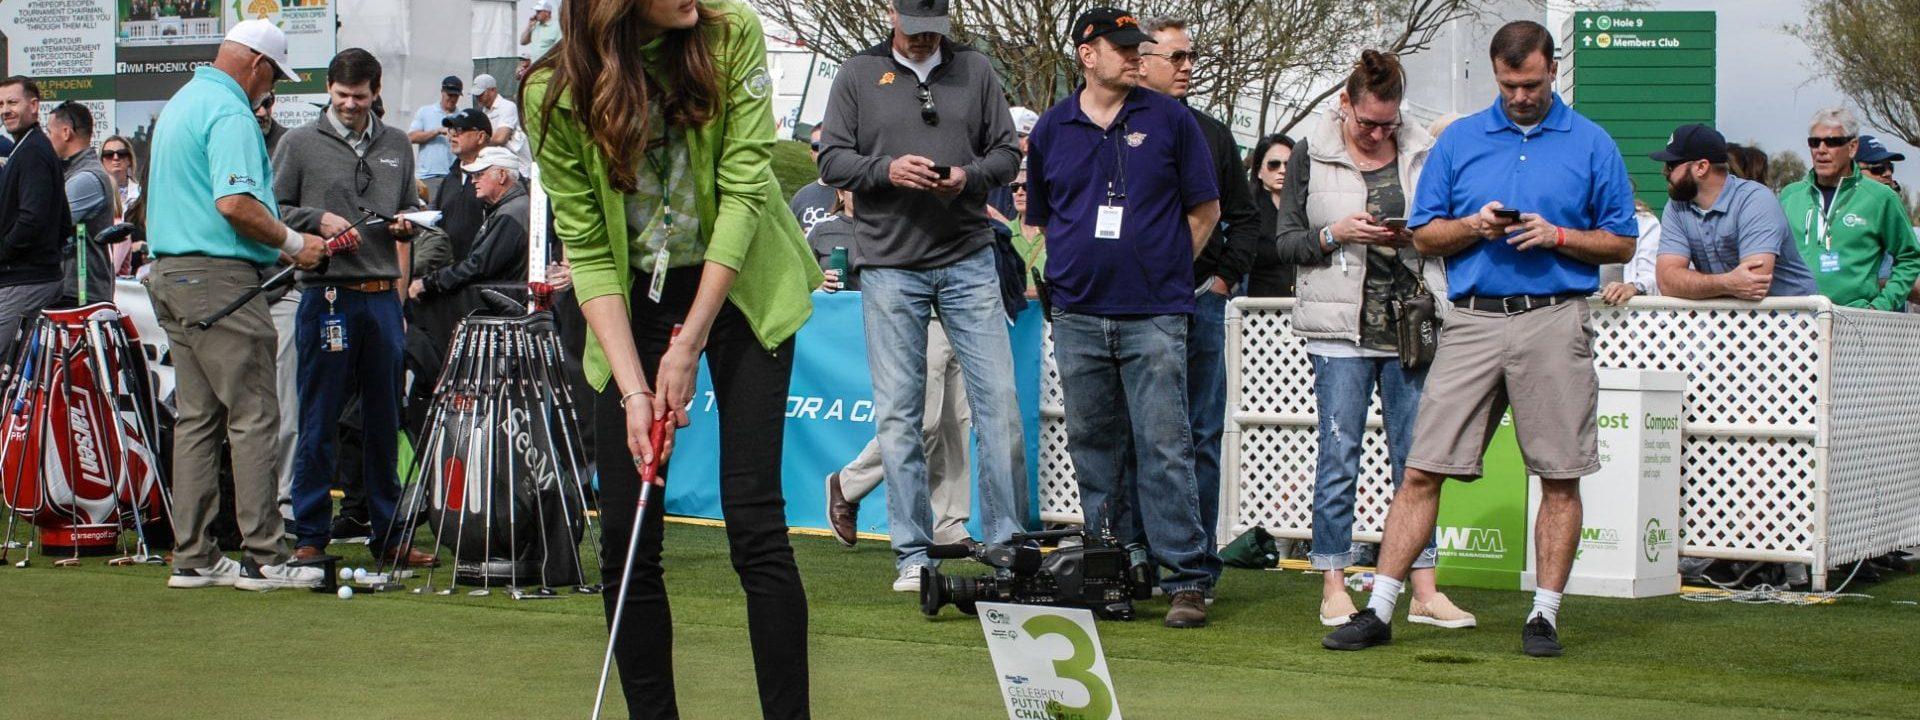 Celebrity putting challenge participant golfing